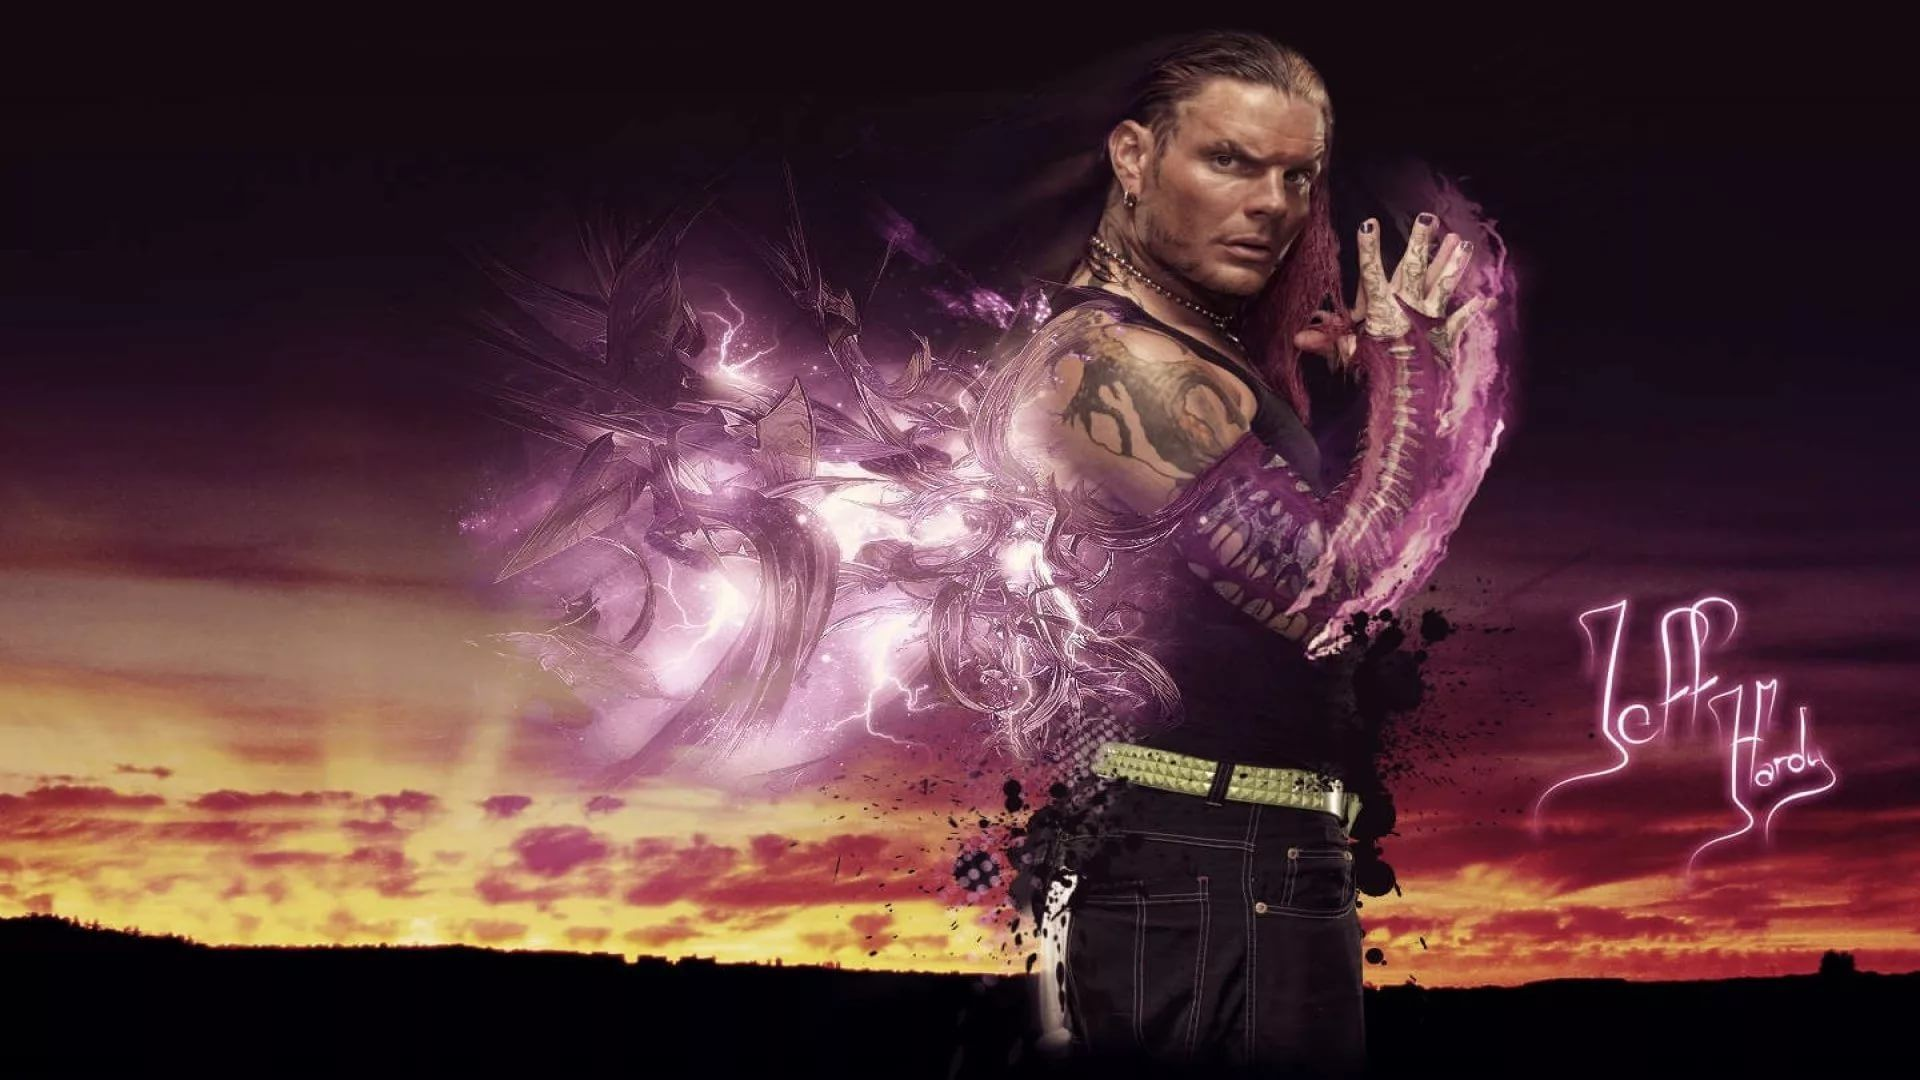 Jeff Hardy Wallpaper Image